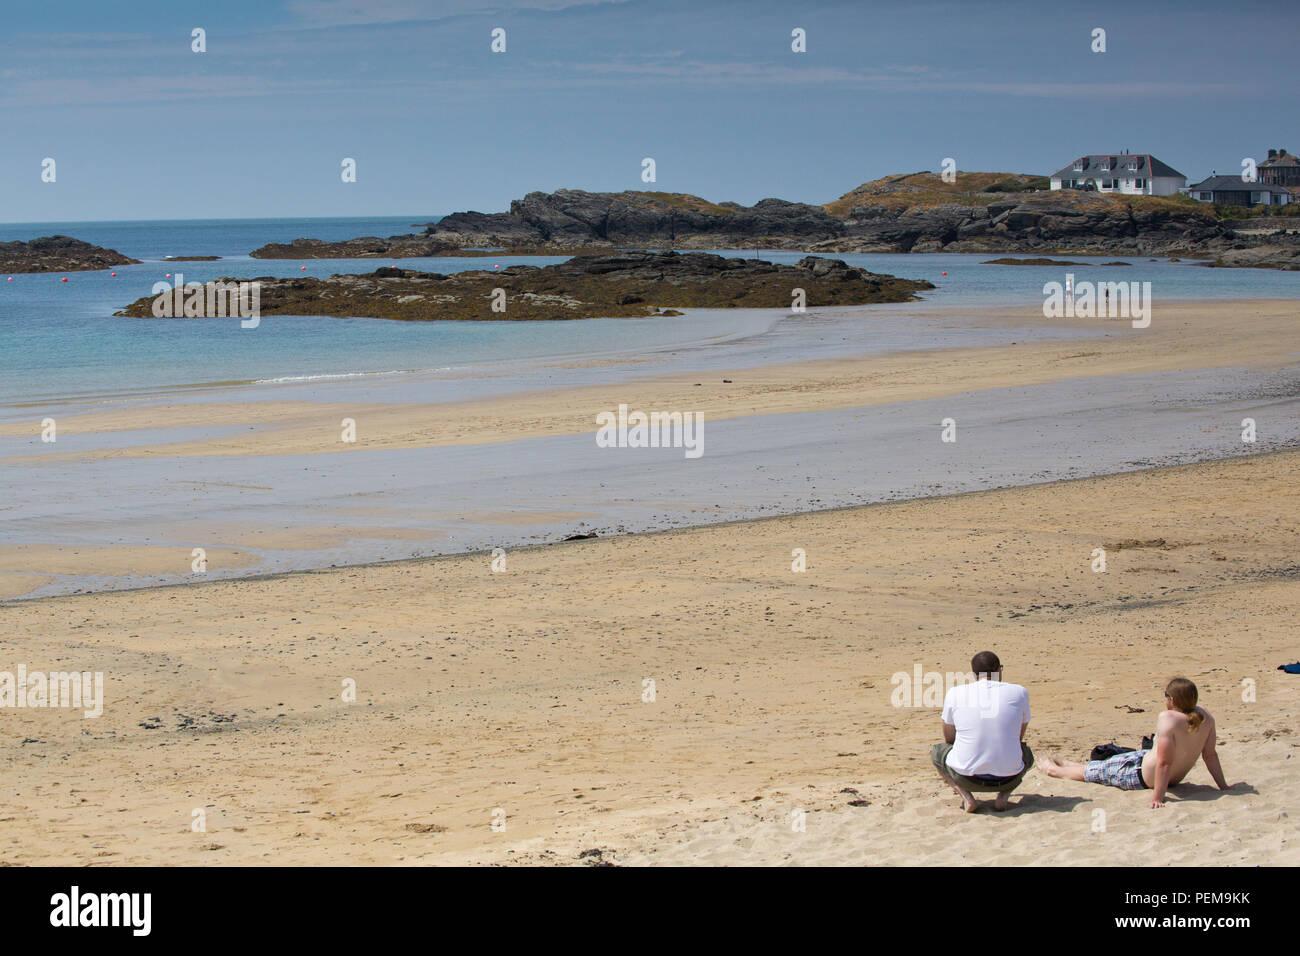 Trearddur Bay on a hot summer's day - Stock Image